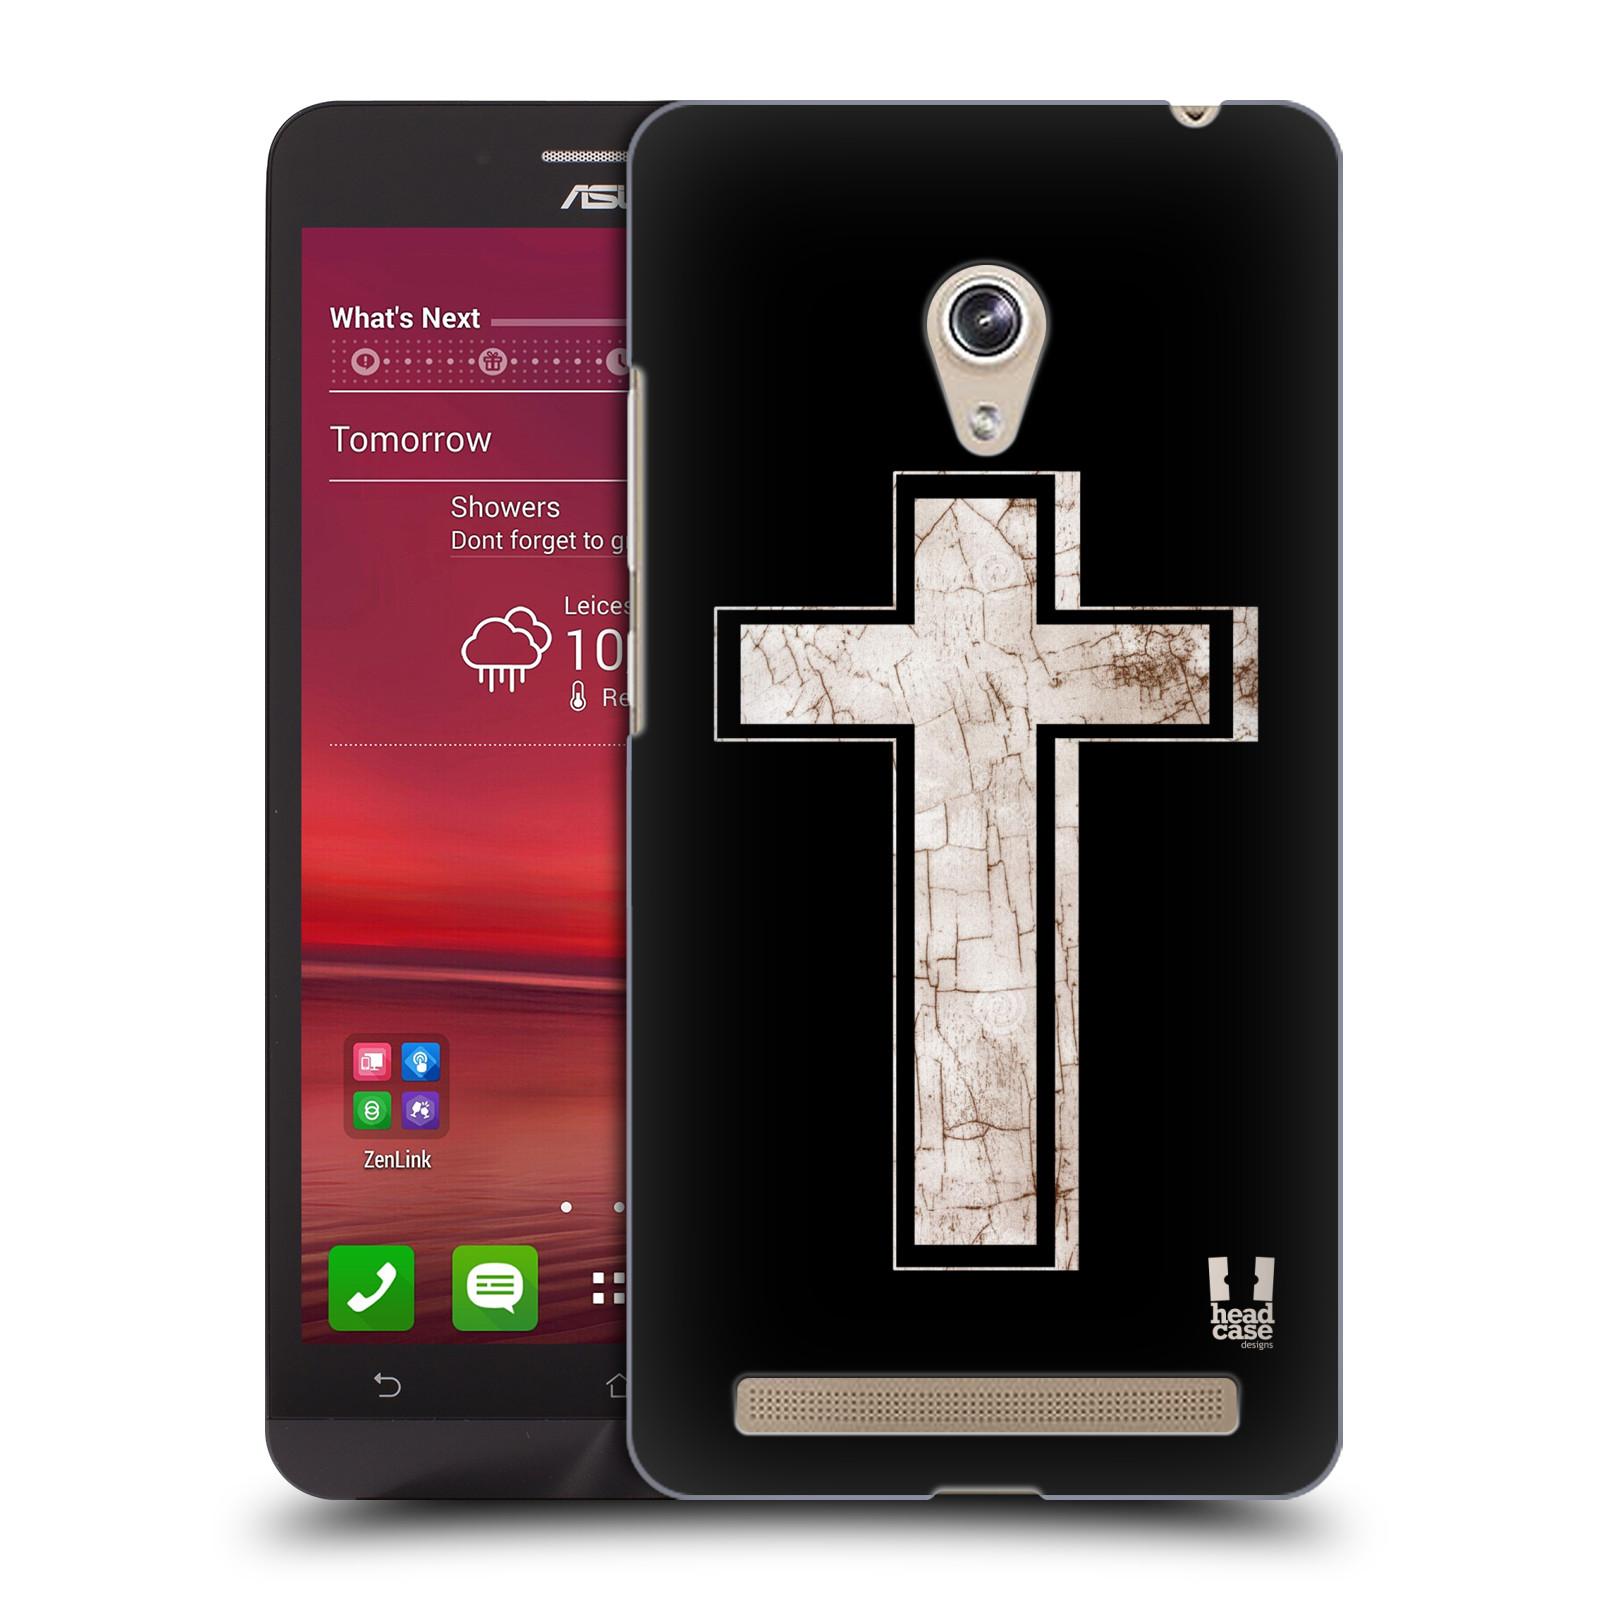 HEAD CASE plastový obal na mobil Asus Zenfone 6 vzor Kříž Cross PORCELÁN TEXTURA černá a bílá